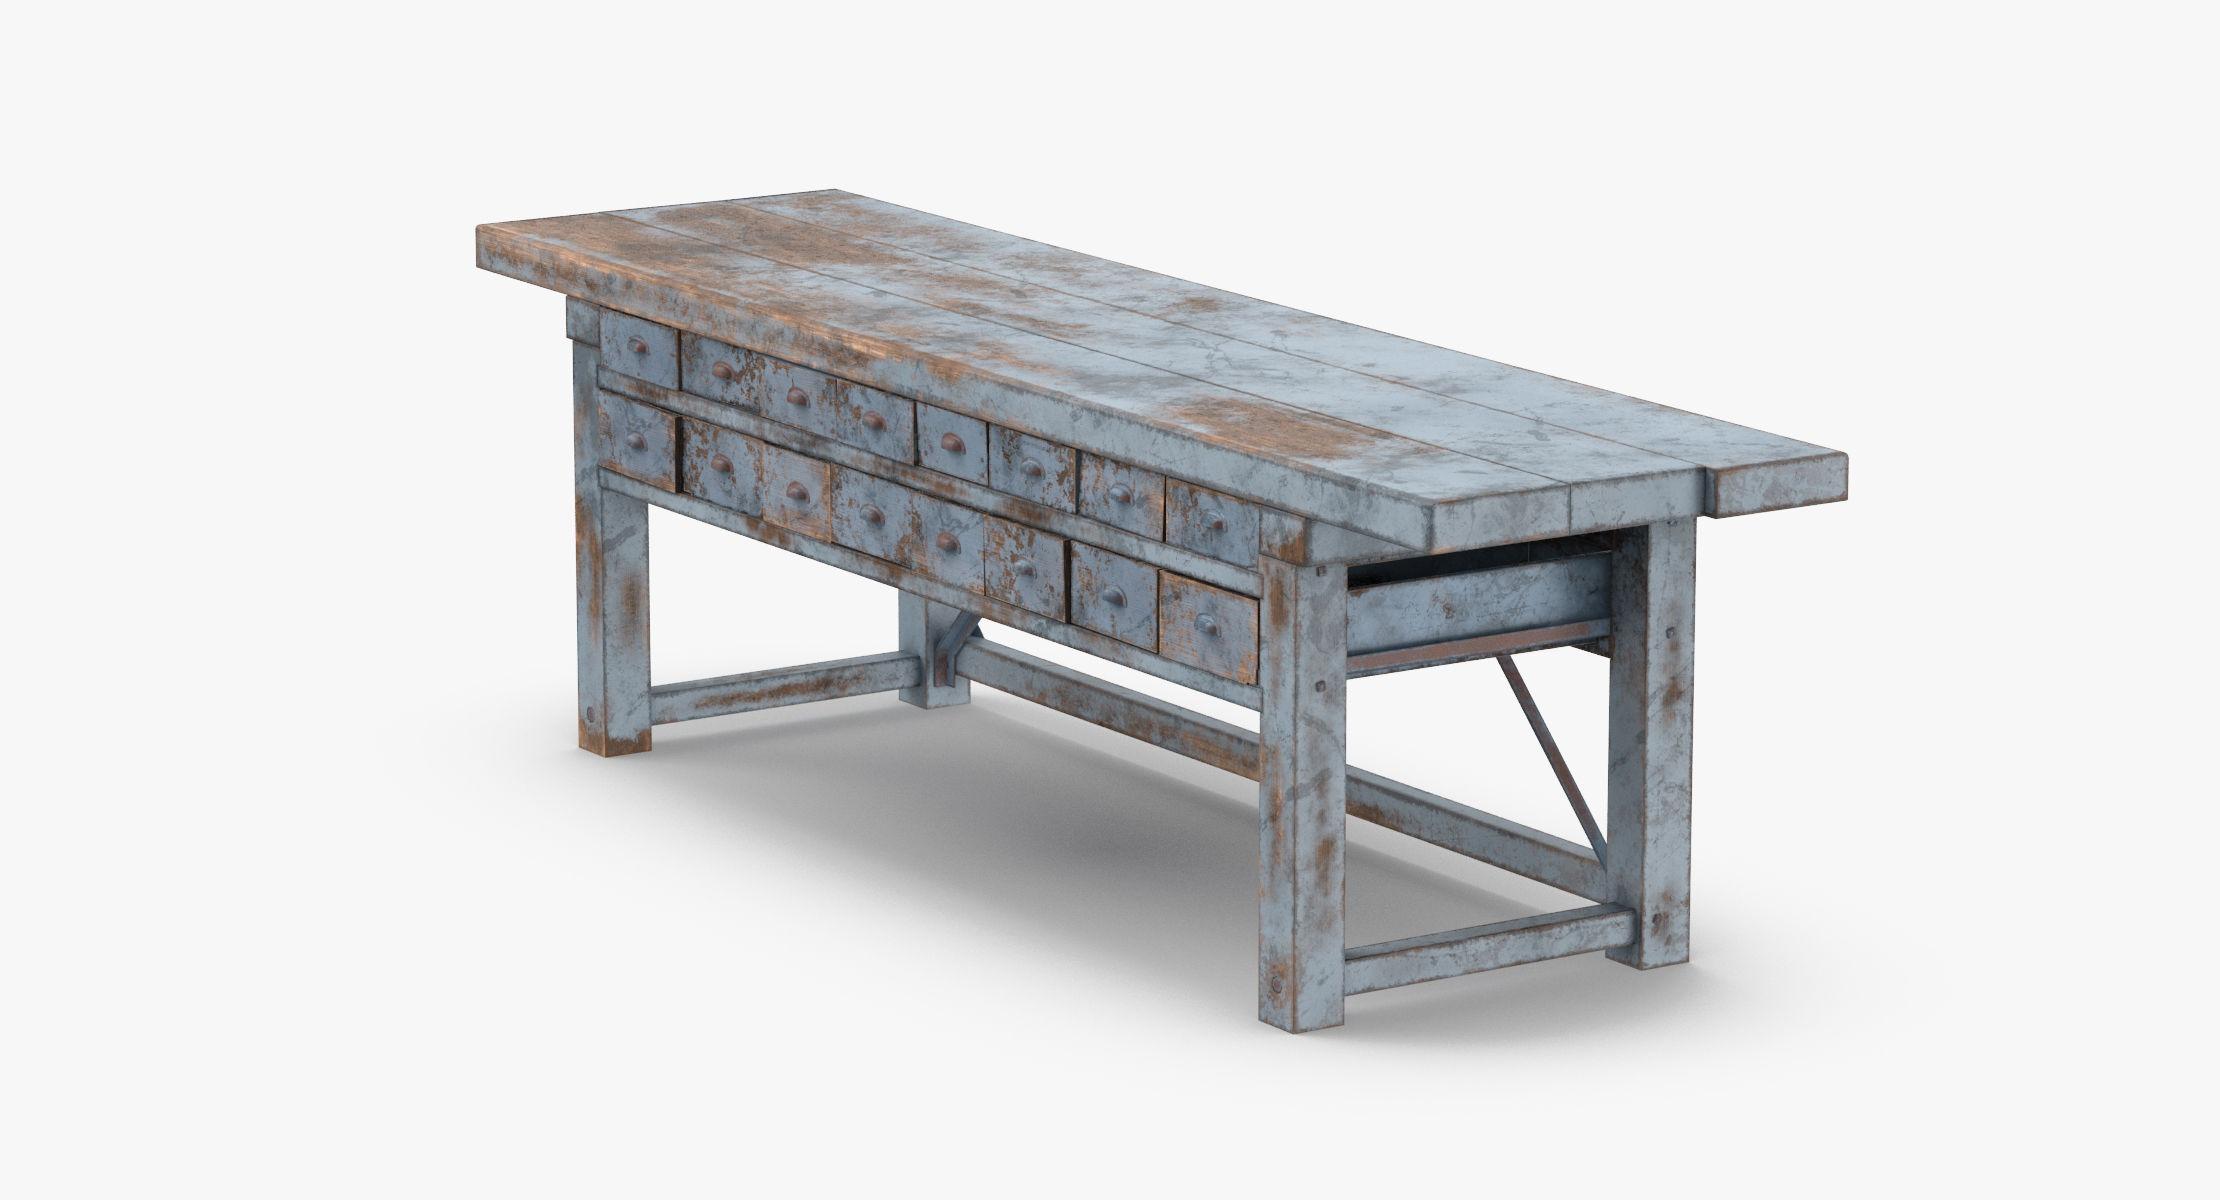 Blacksmiths Table - reel 1